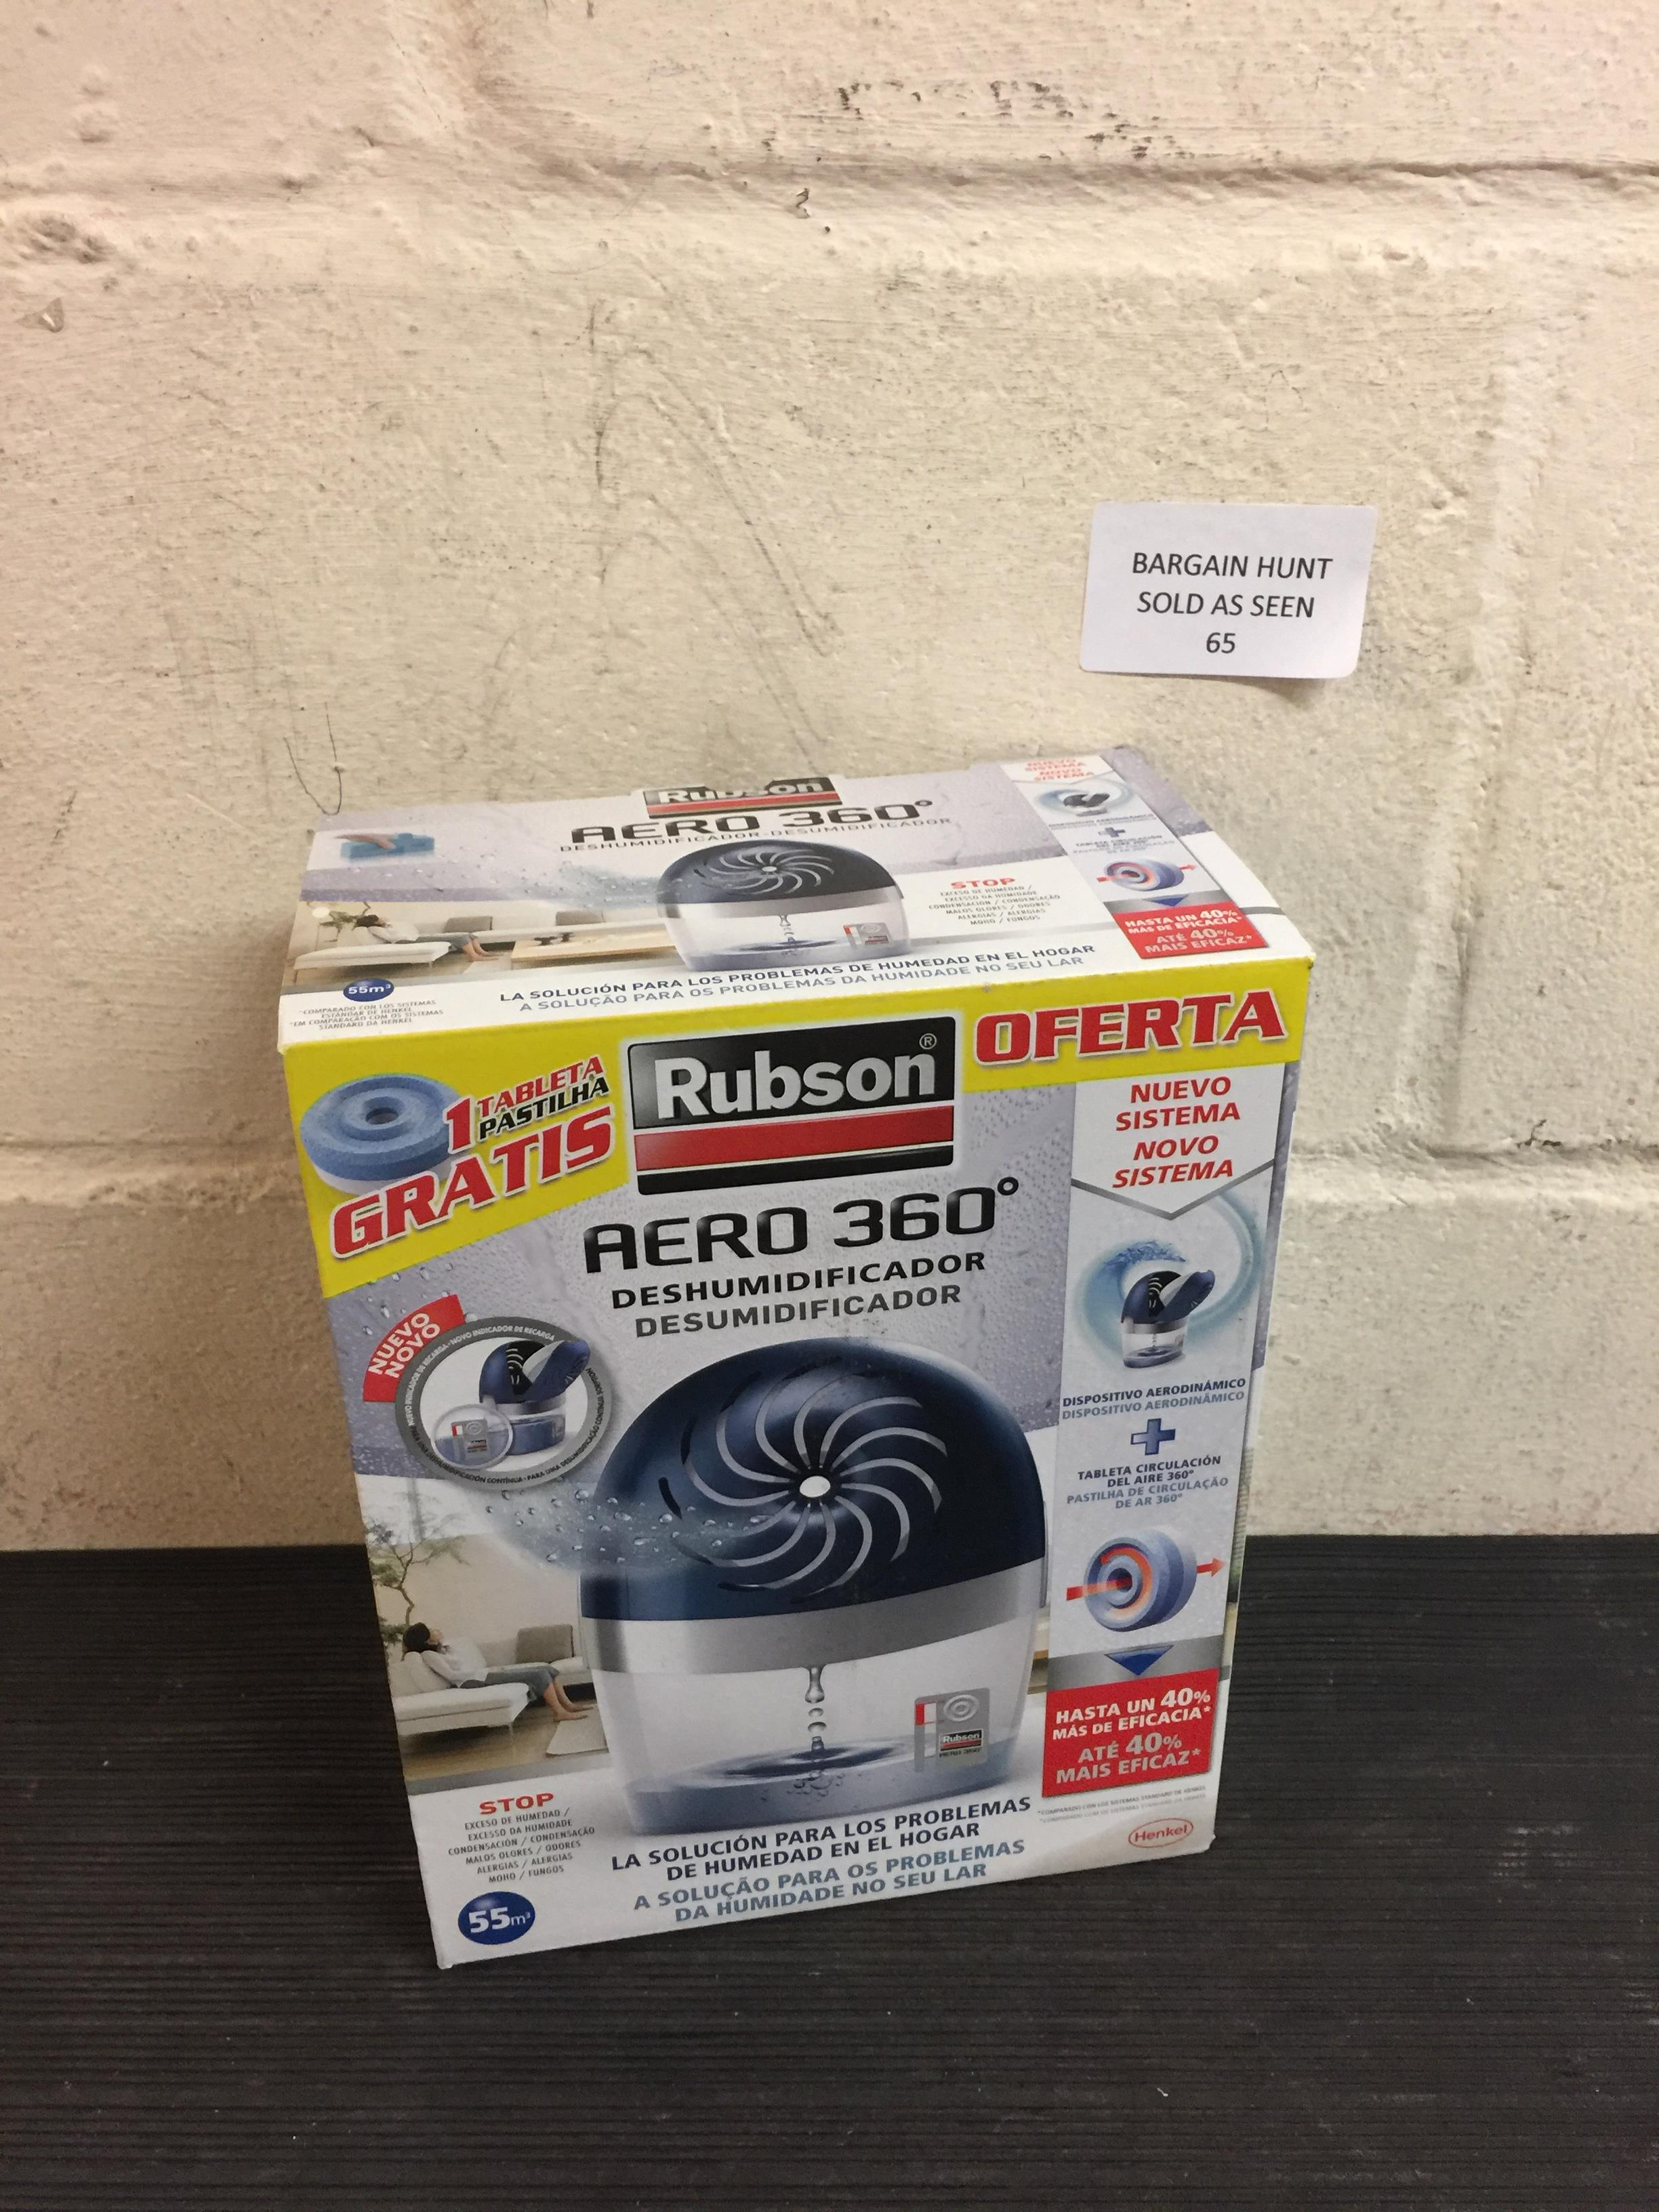 Lot 65 - Rubson Aero 360 Dehumidifier